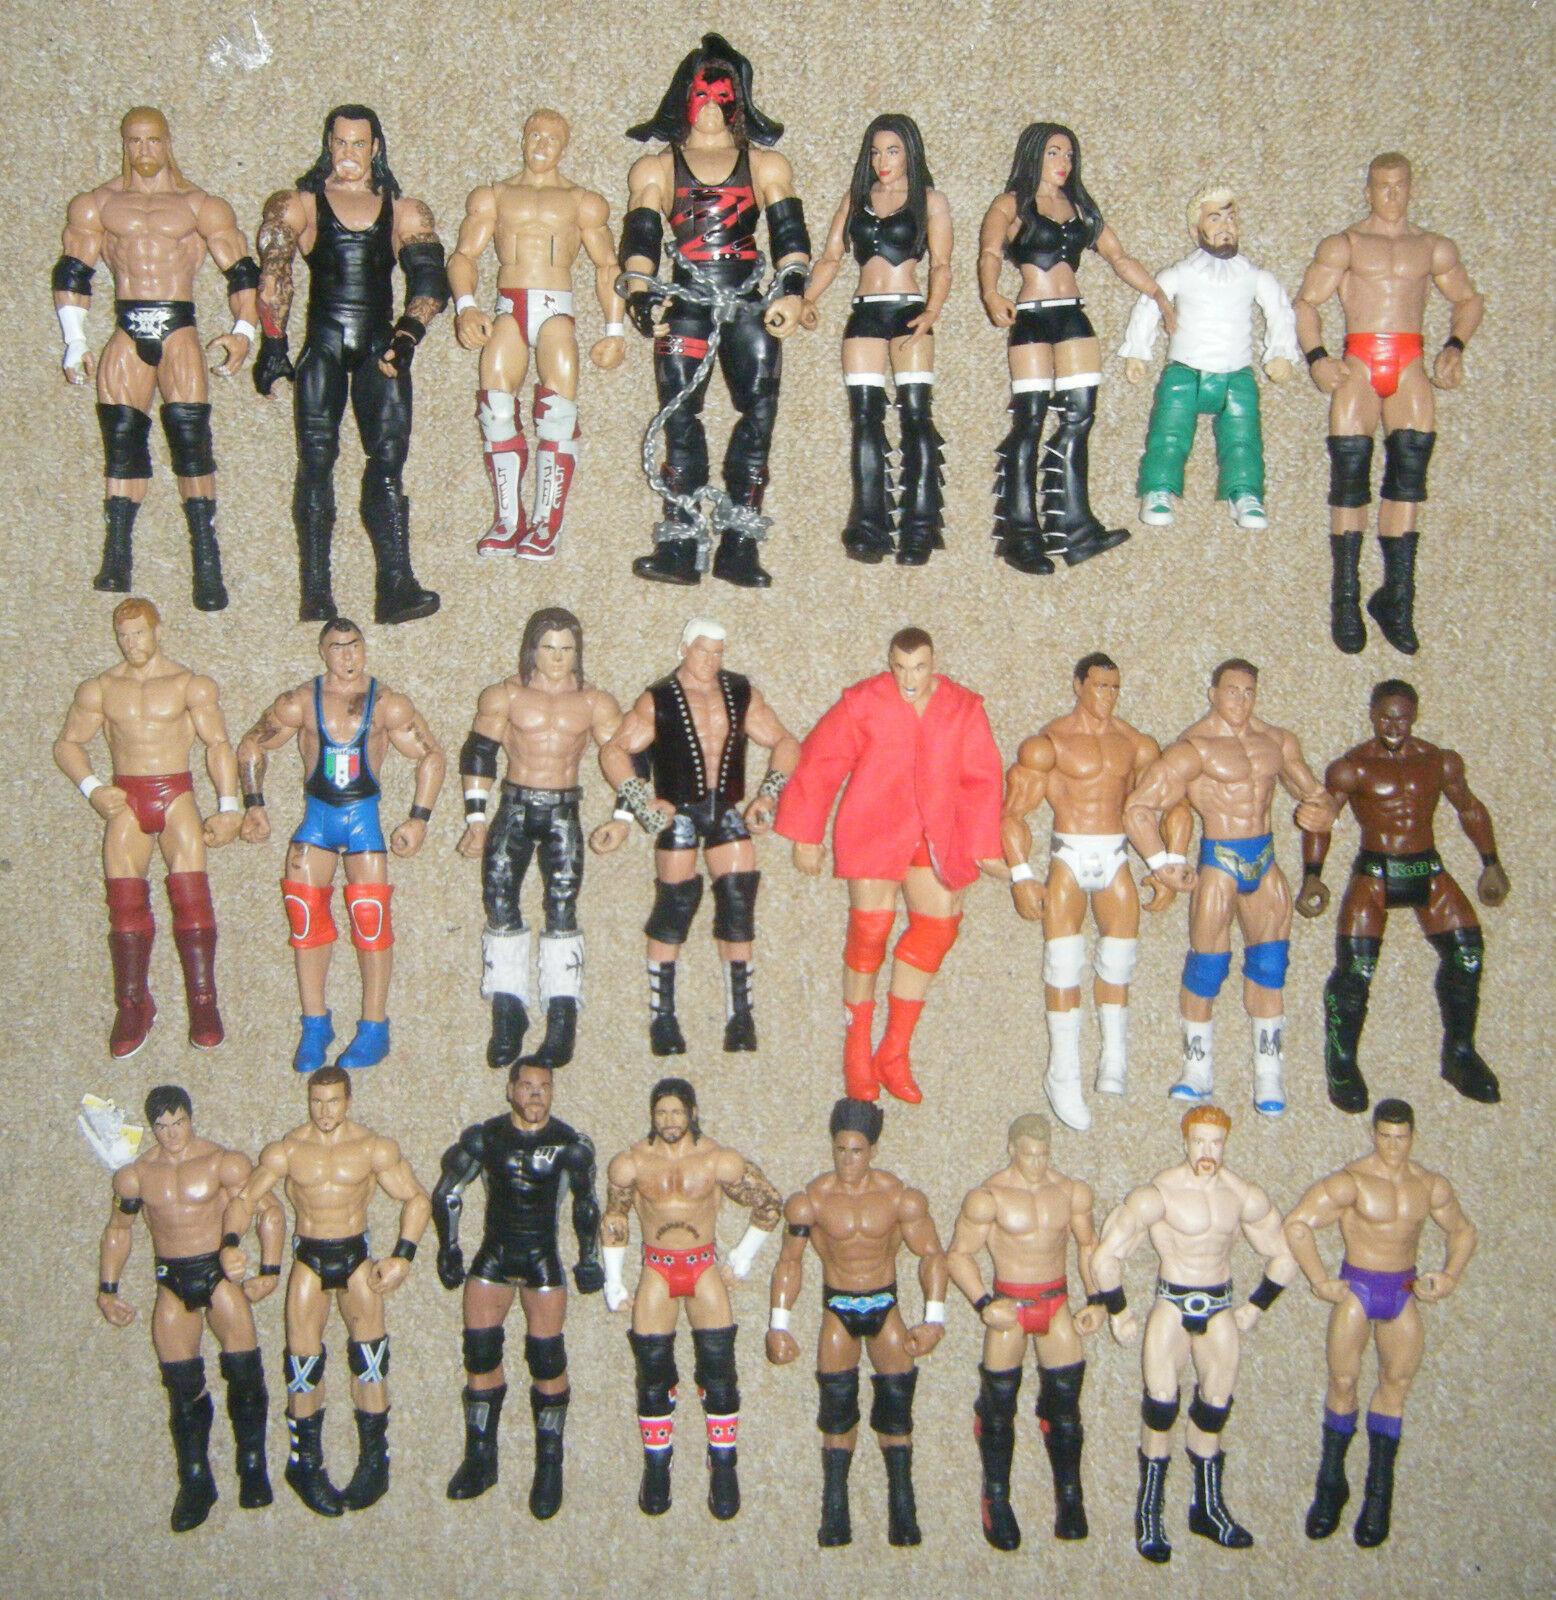 Wwe Mattel Base Serie Élite Azione Wrestling Figure Ringside Esclusivo Wwf Tna